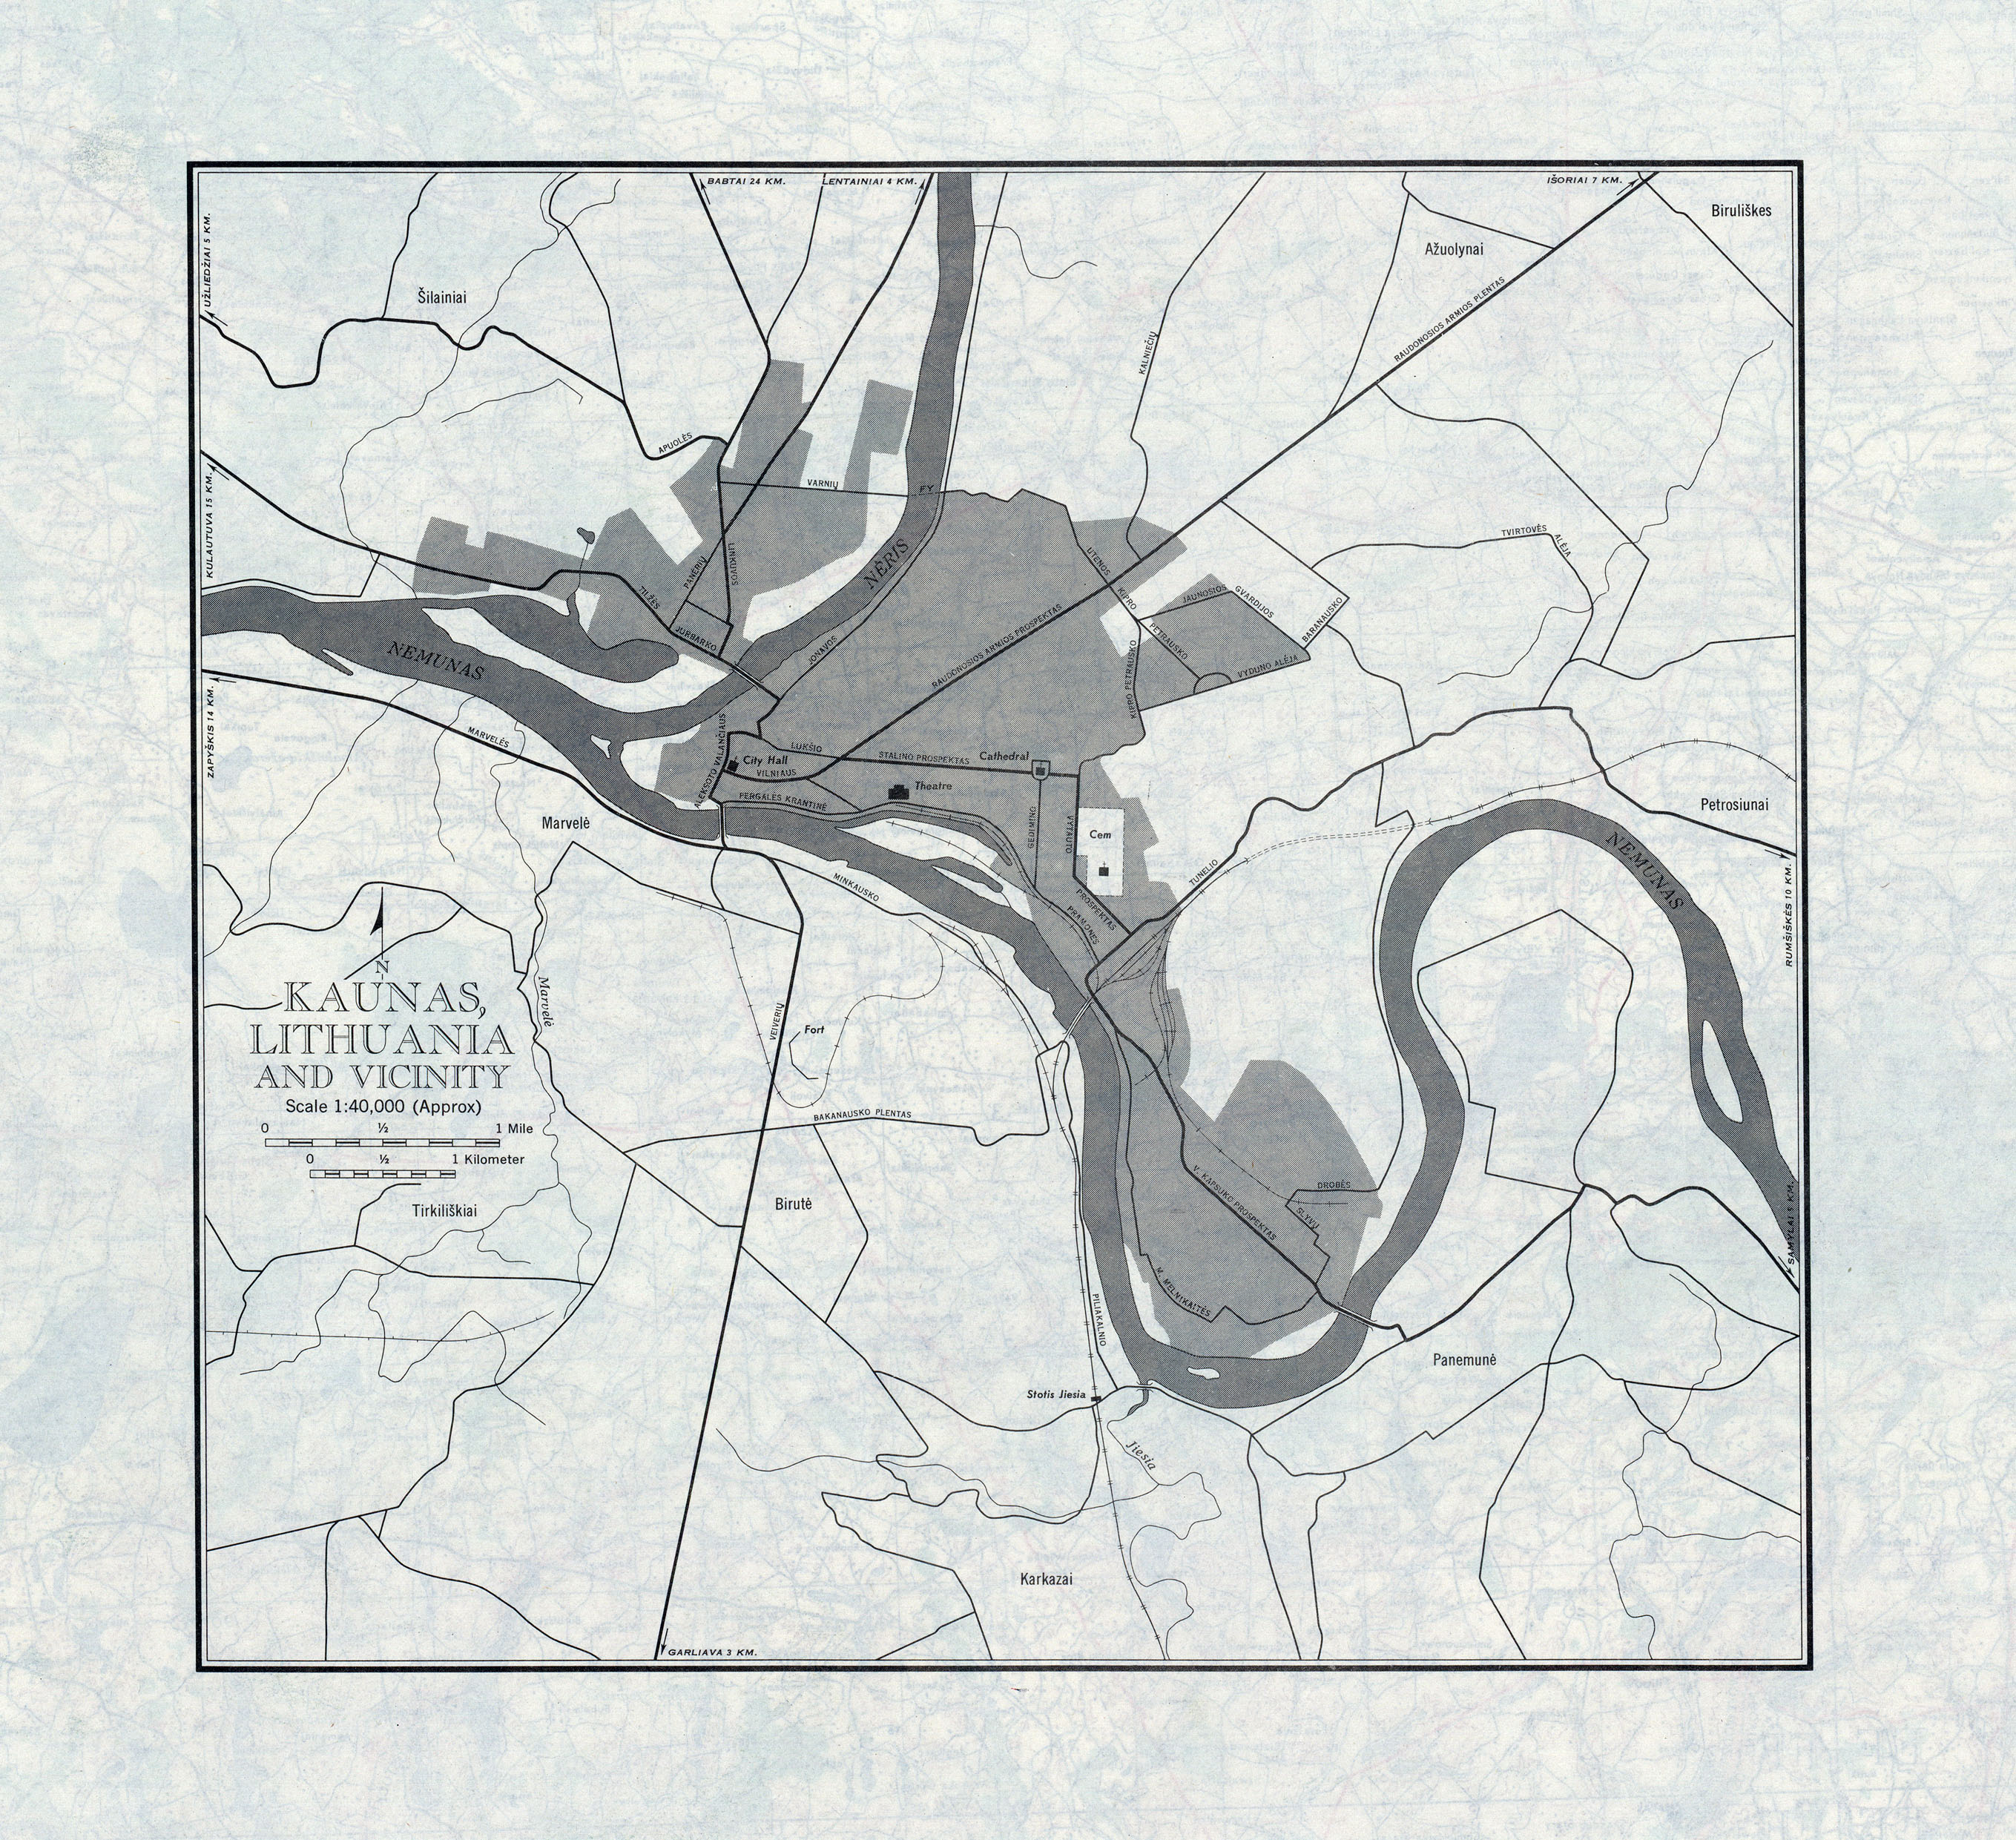 FileUSSR Map NN Verso Kaunas Lithuania And Vicinityjpg - Kaunas map